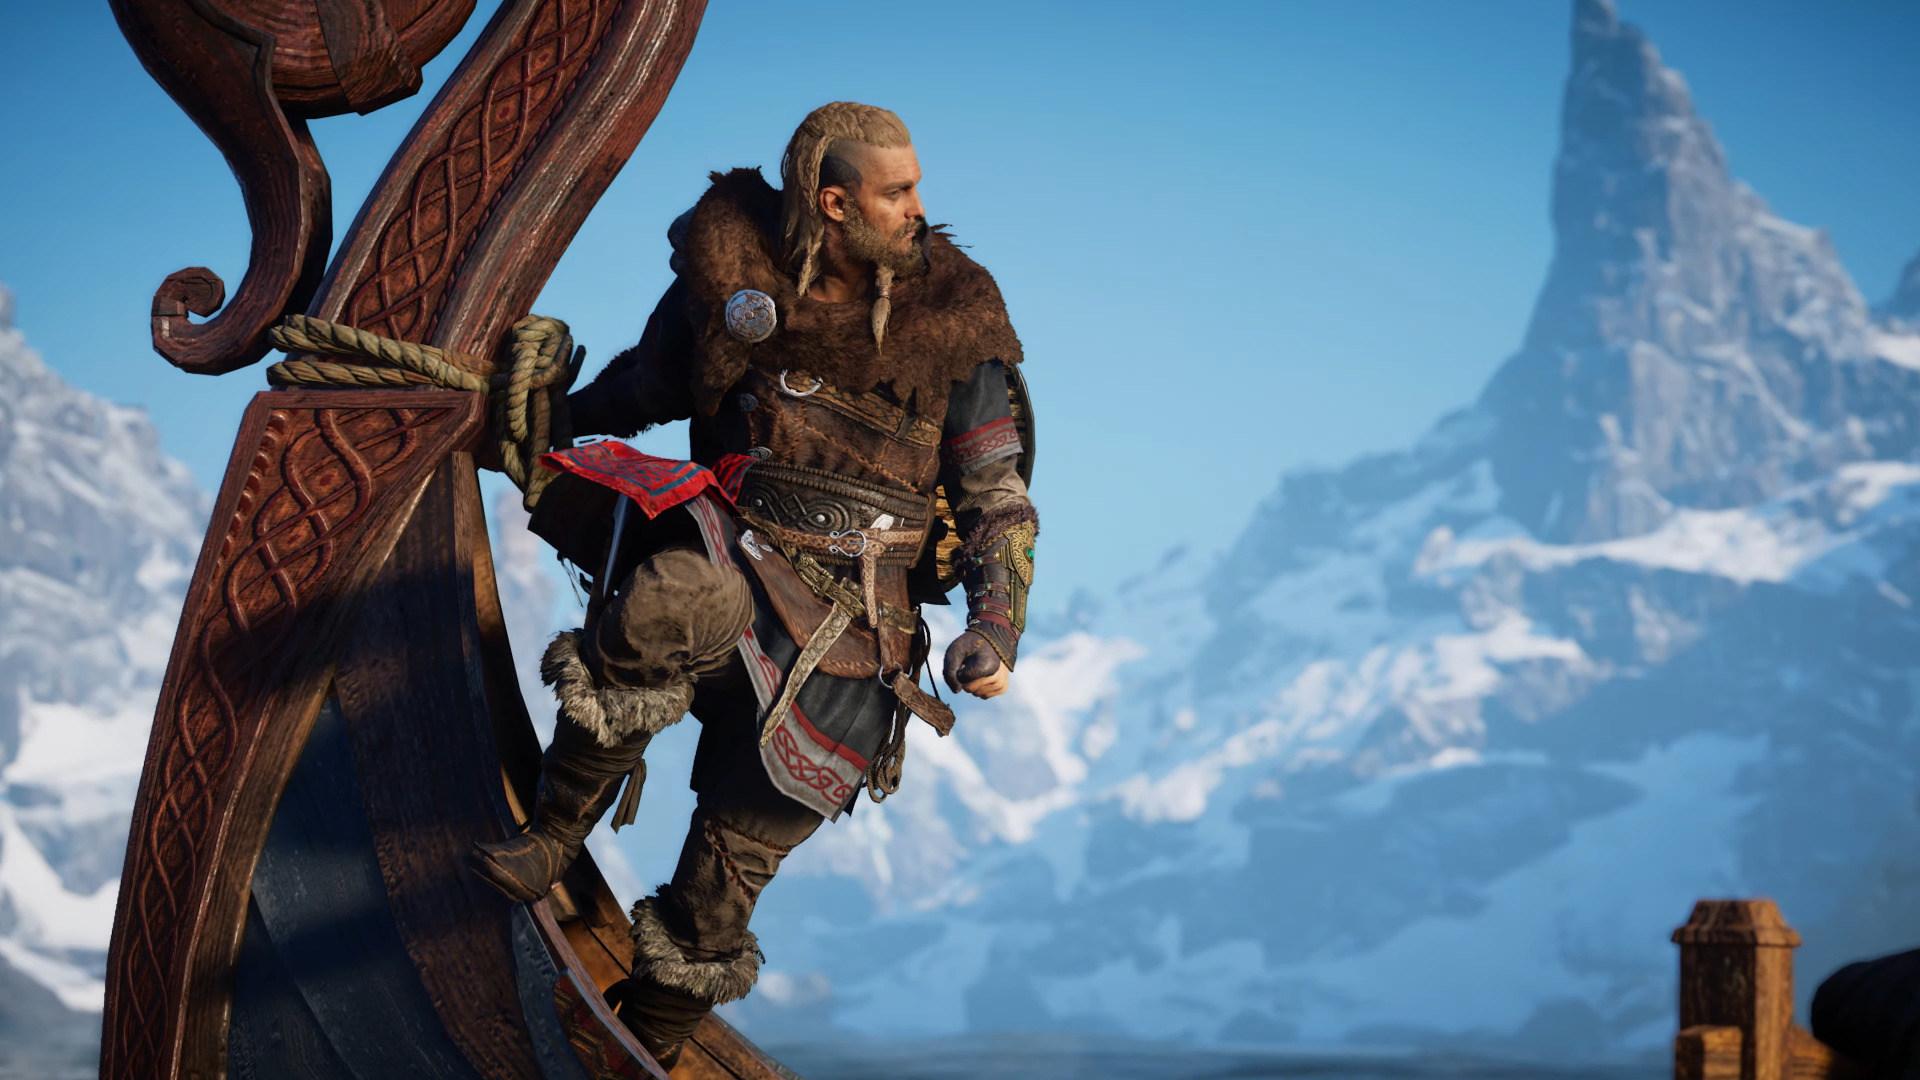 Ubisoft, Assassin's Creed, Assassin's Creed Valhalla